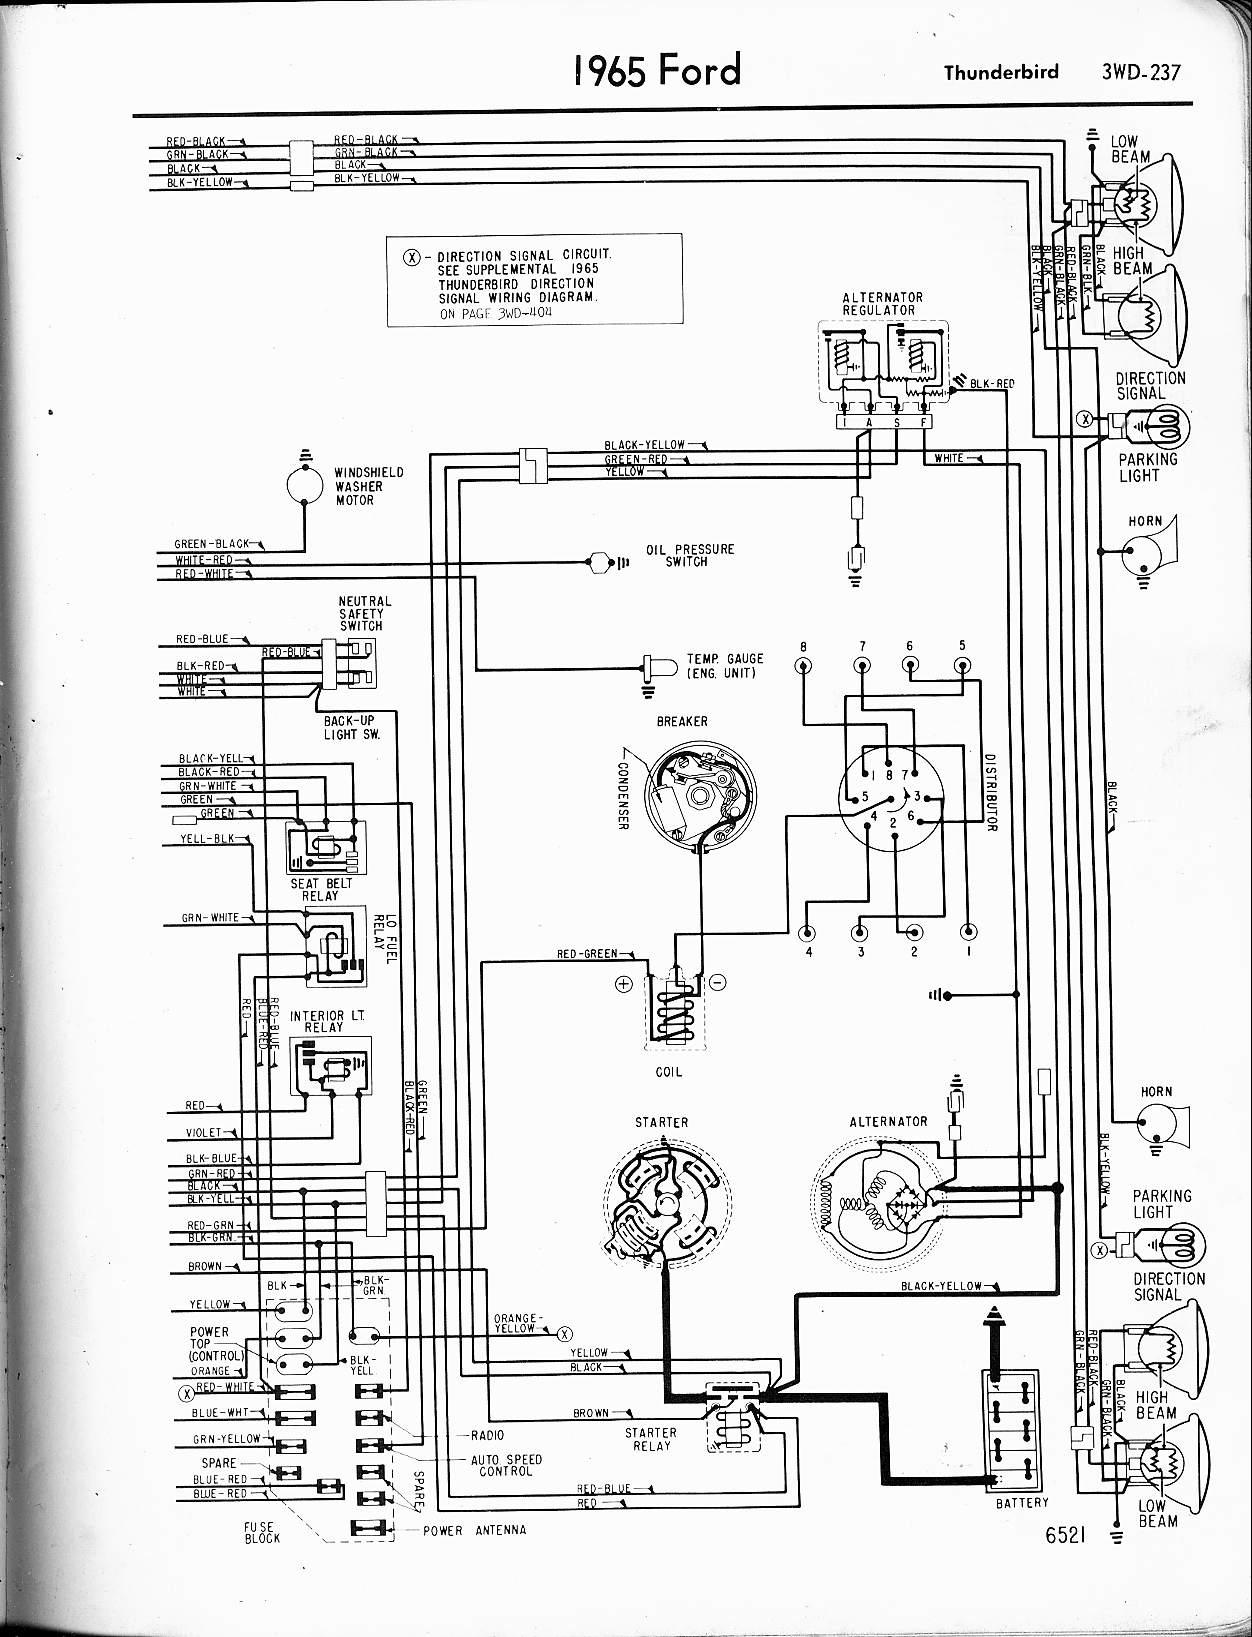 hight resolution of 1965 ford thunderbird alternator wiring diagram image details 1965 ford thunderbird alternator wiring diagram